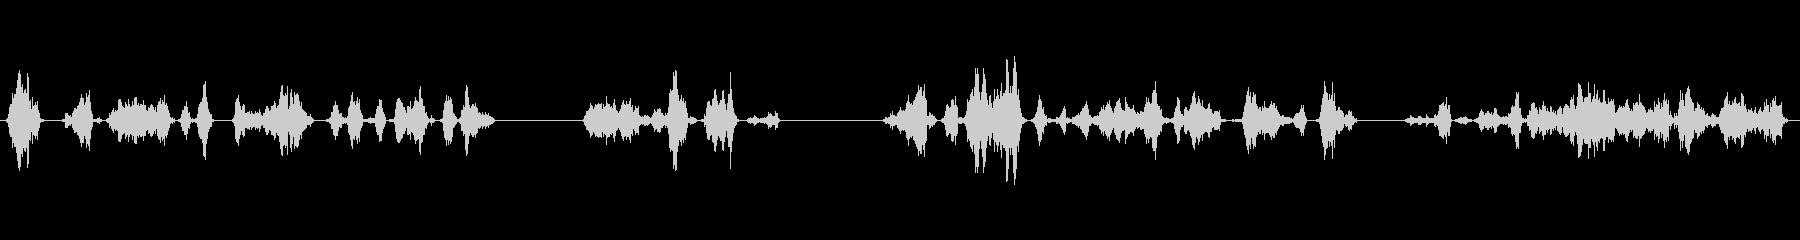 GARGLE MONSTER、SC...の未再生の波形